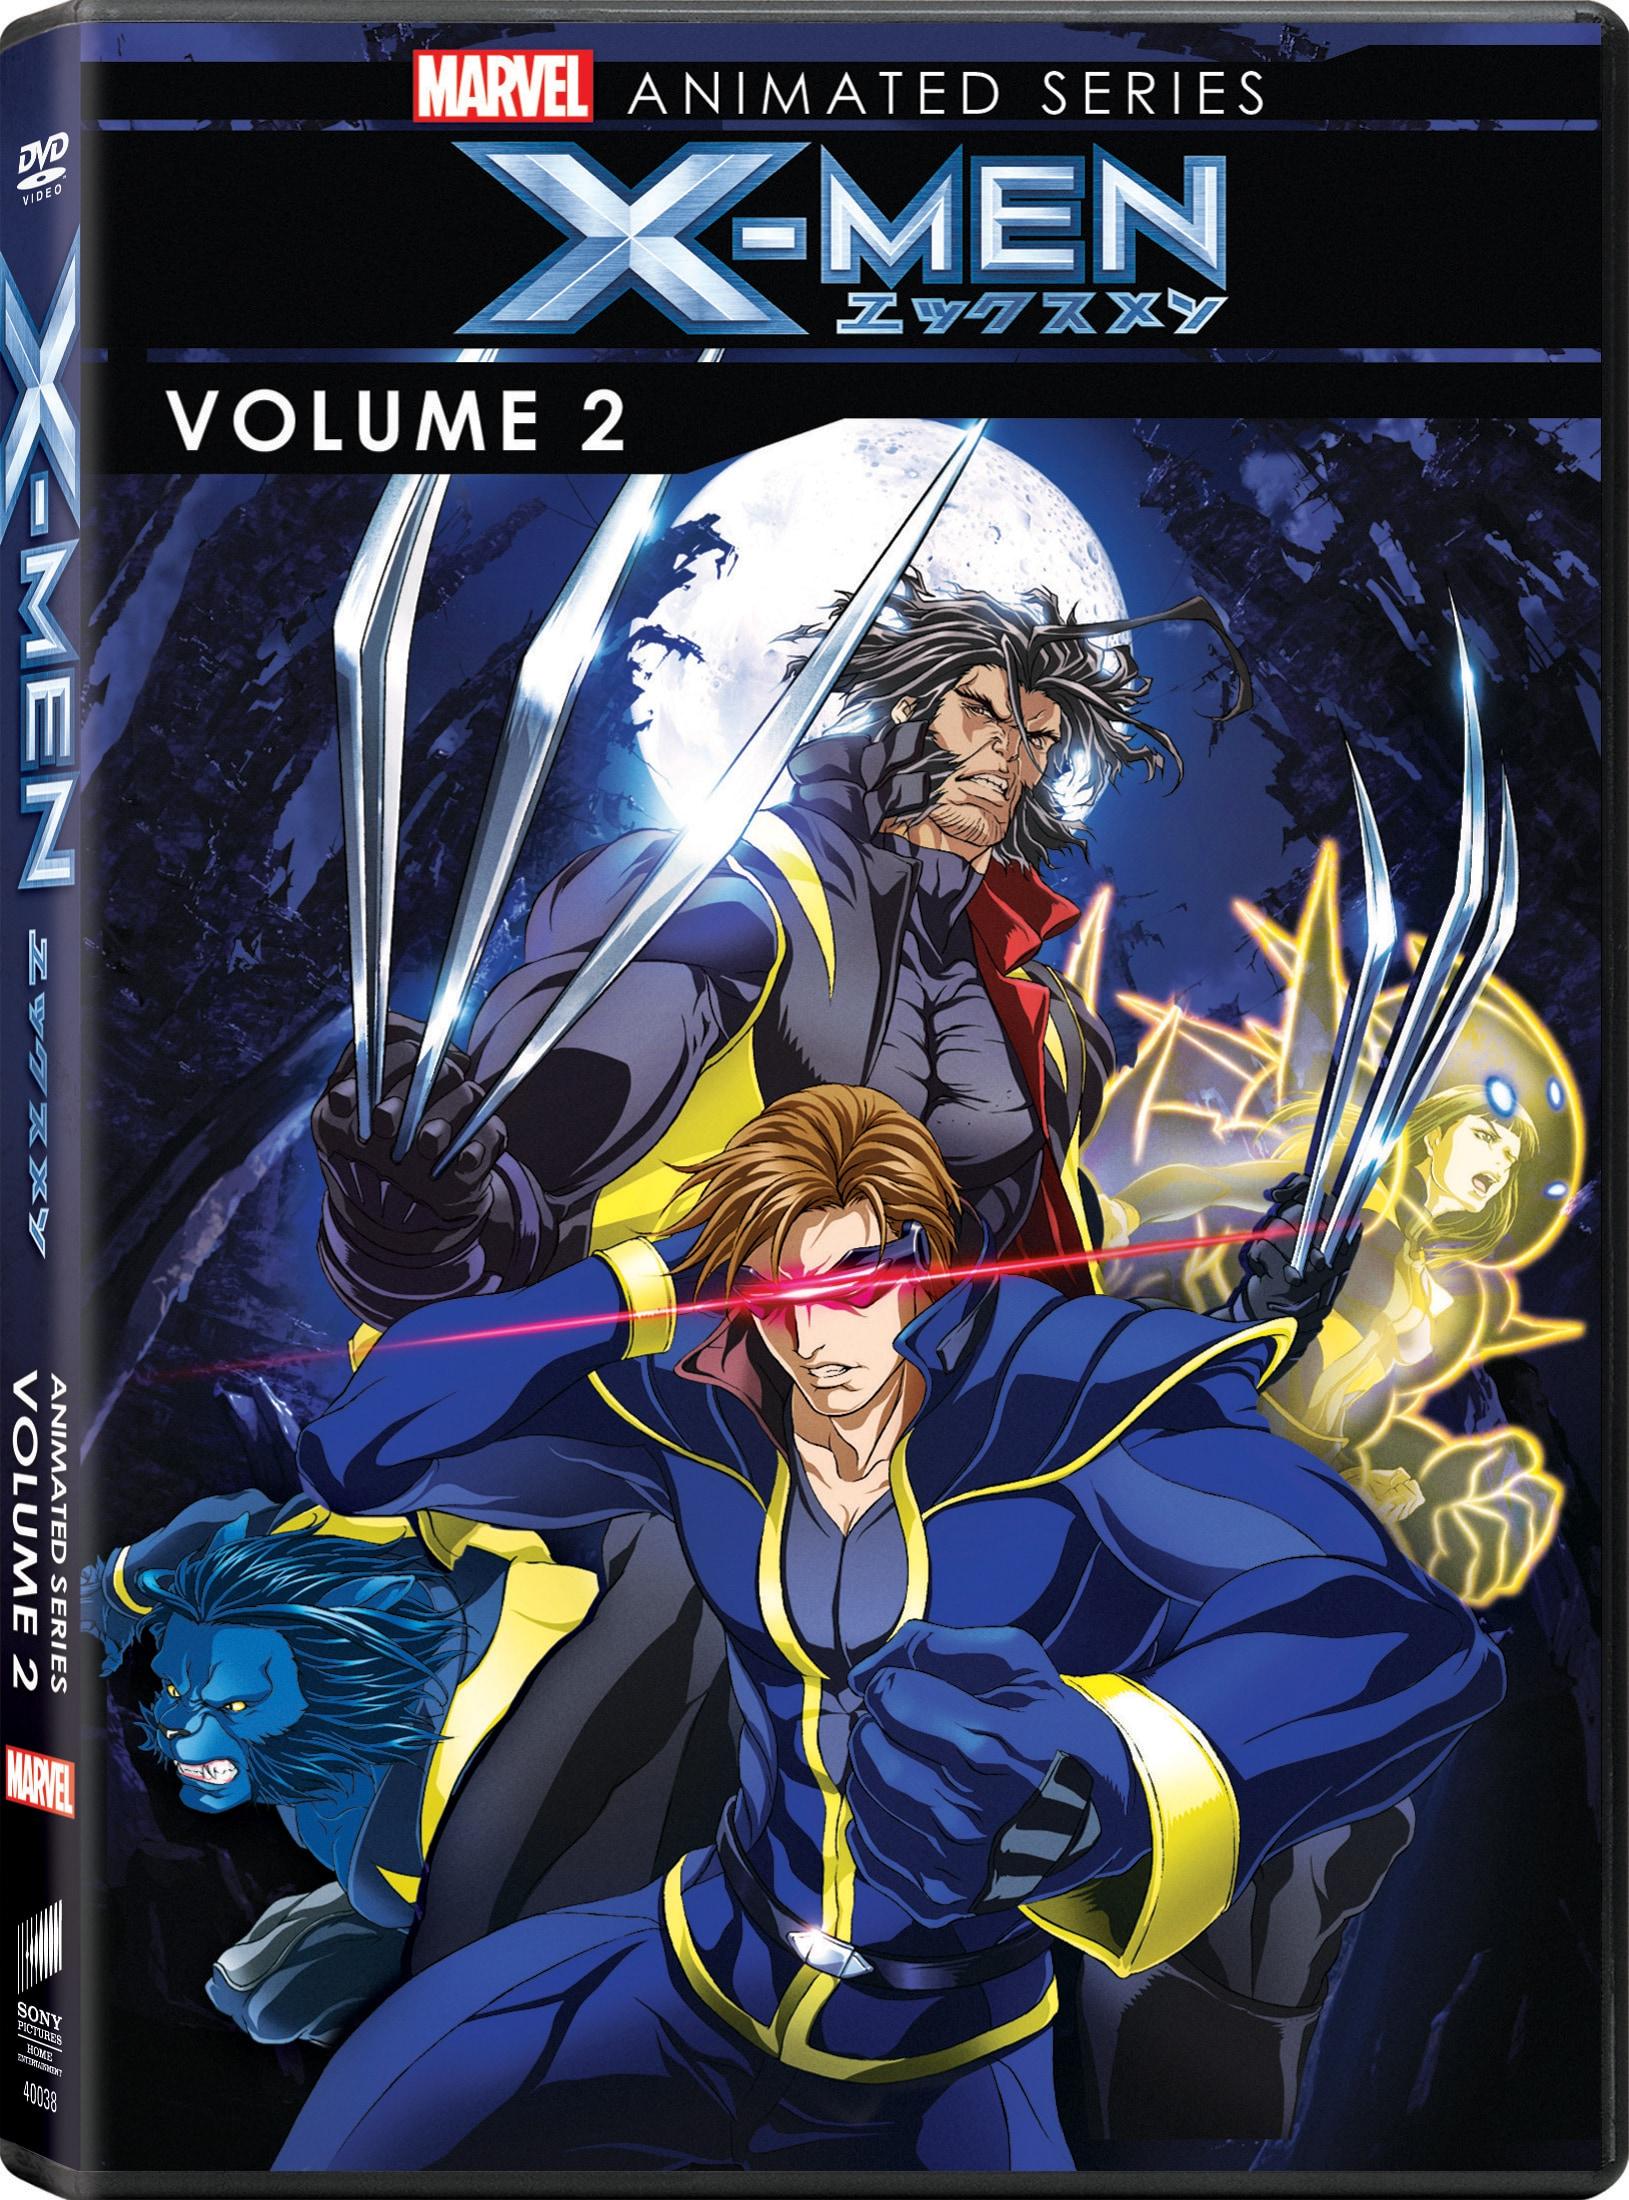 Marvel X-Men: Animated Series Vol. 2 (DVD)